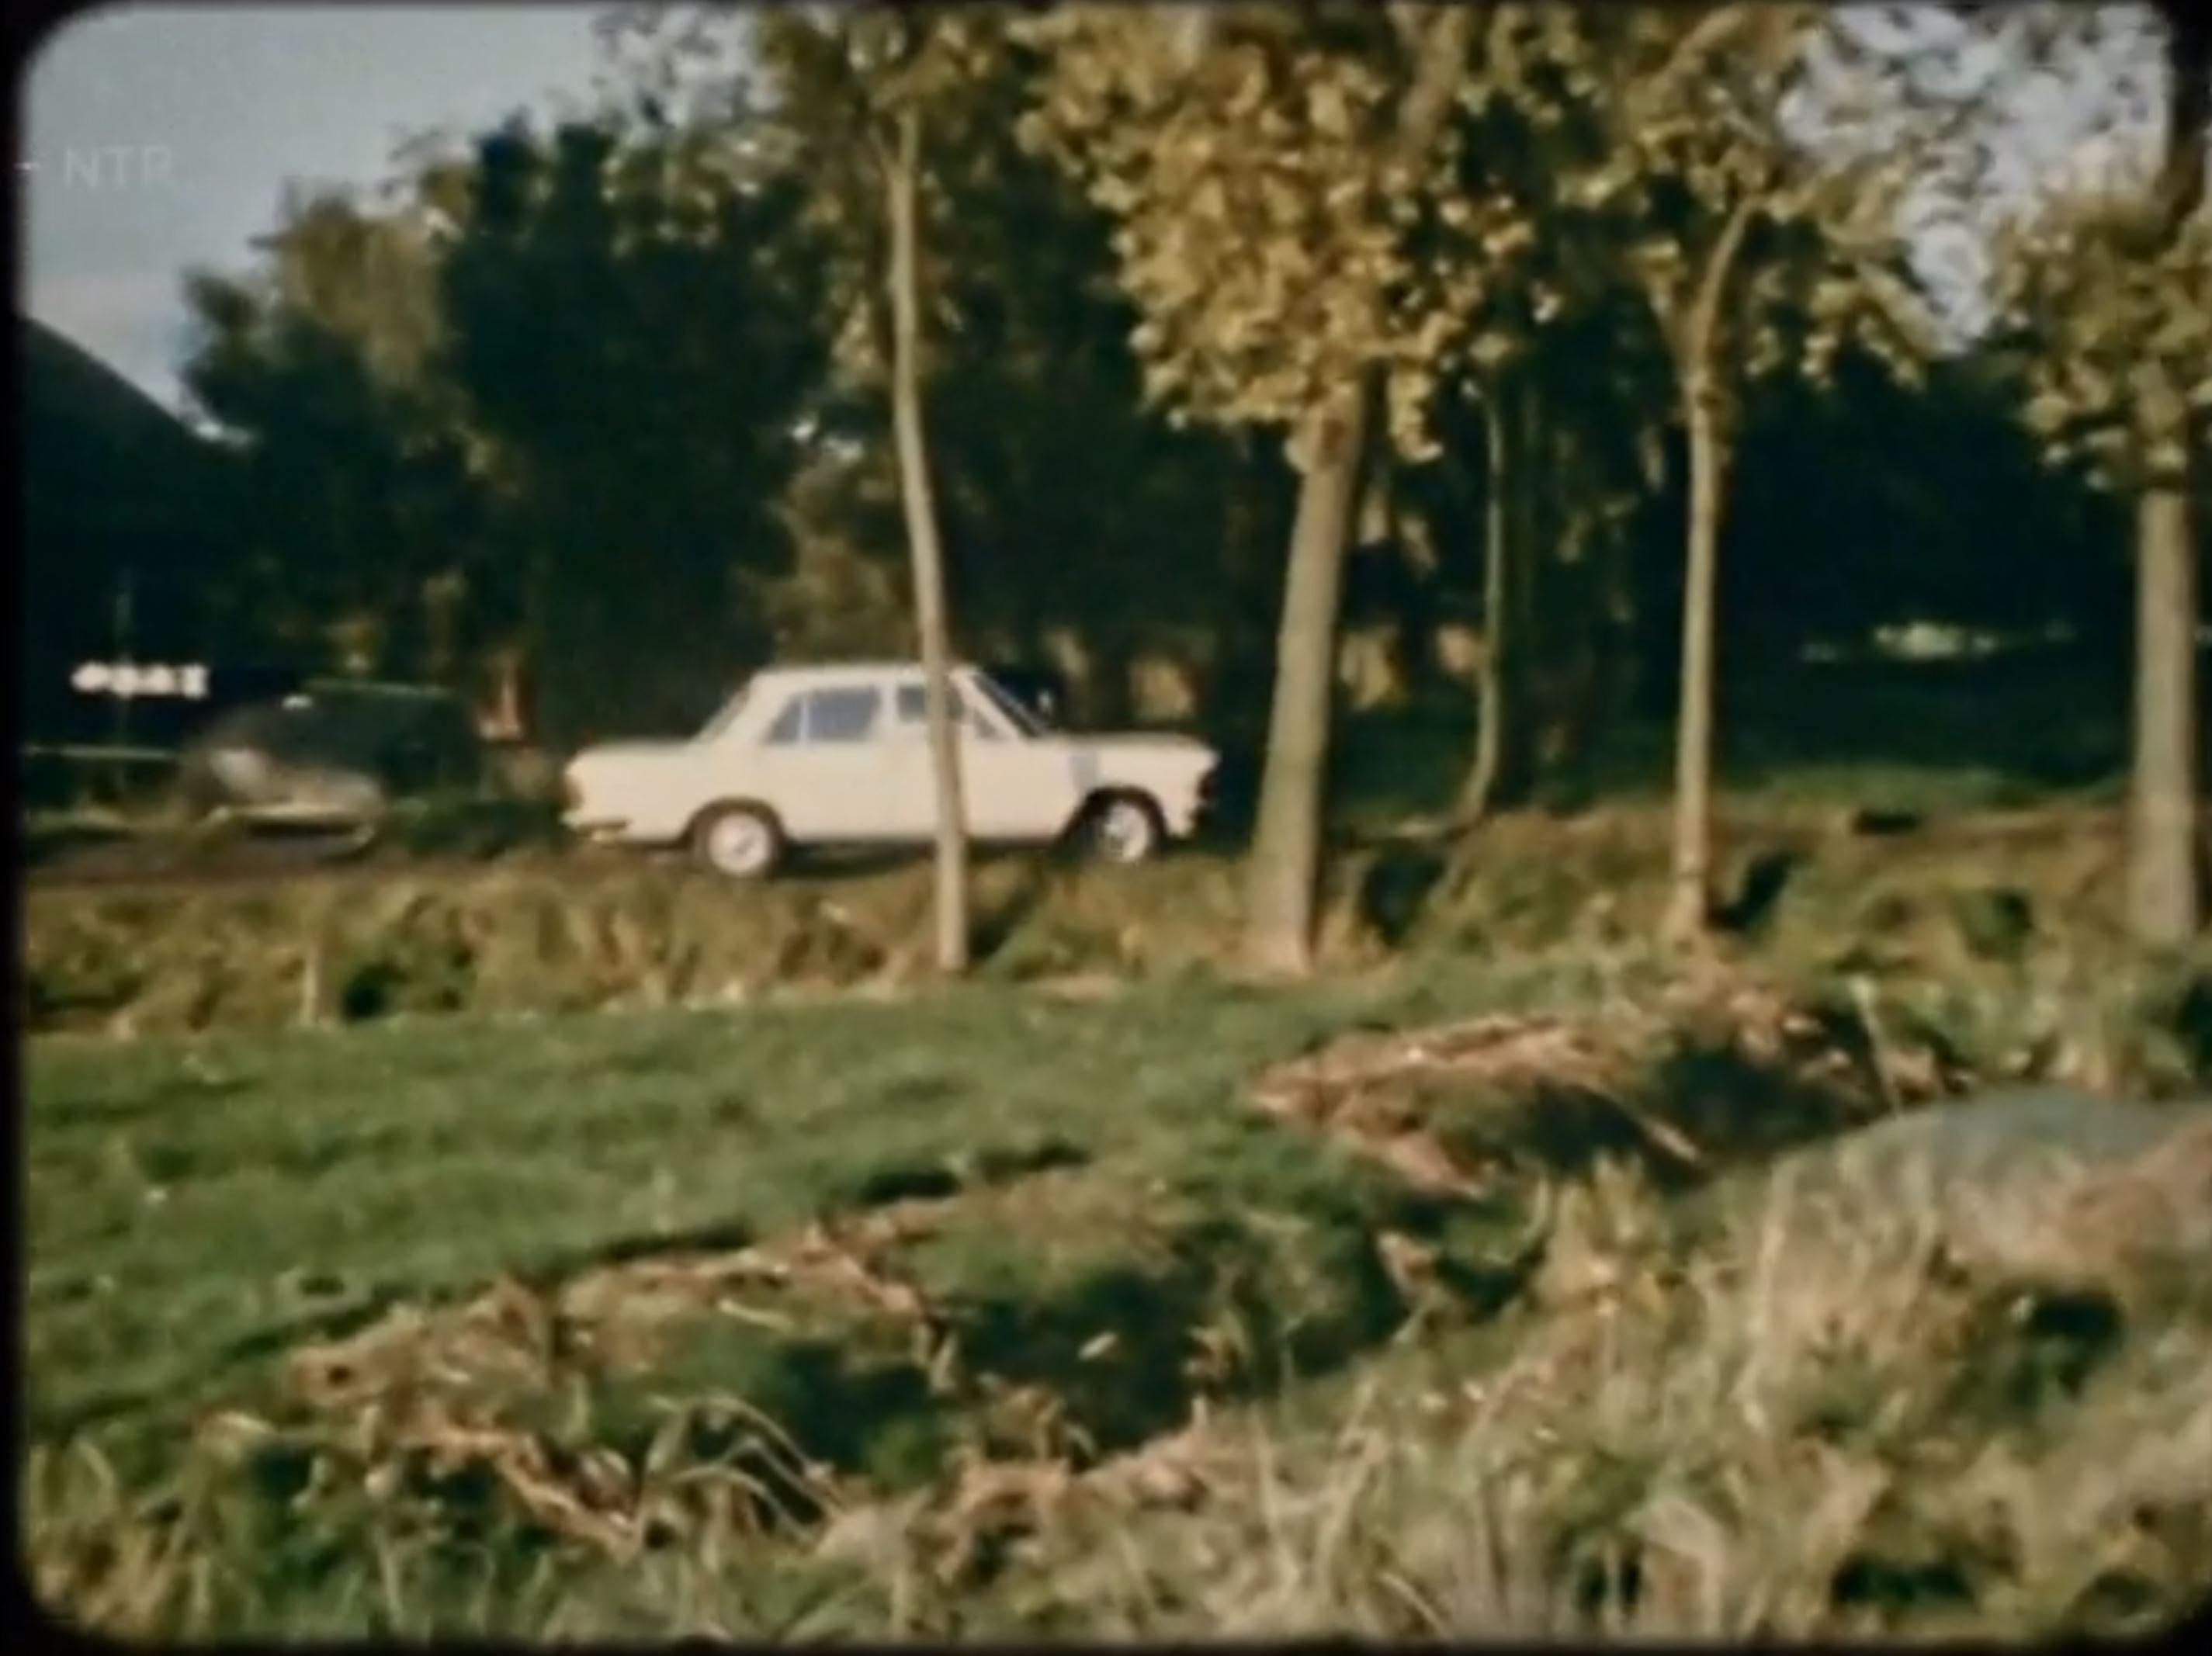 Willem van Hanegem Fiat 130